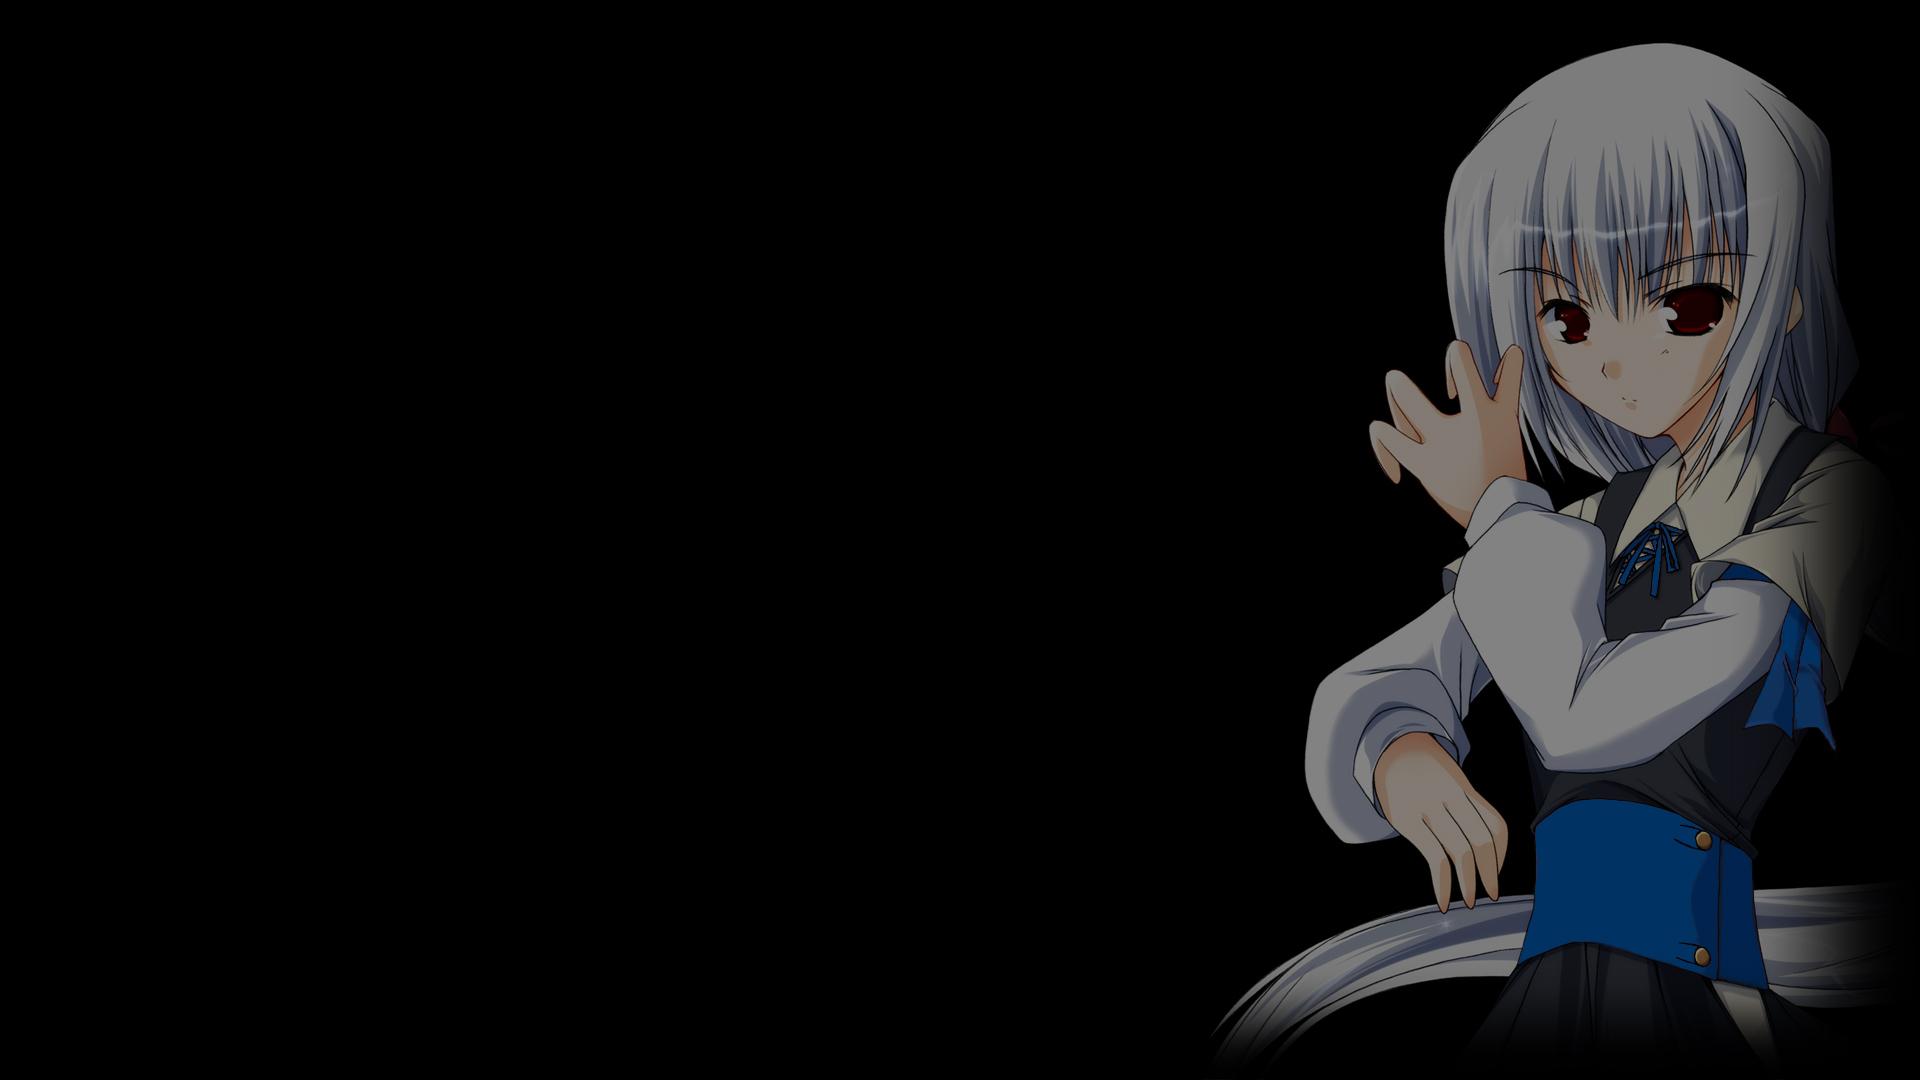 Chinatsu Kagaya (Alt Version) (Profile Background)